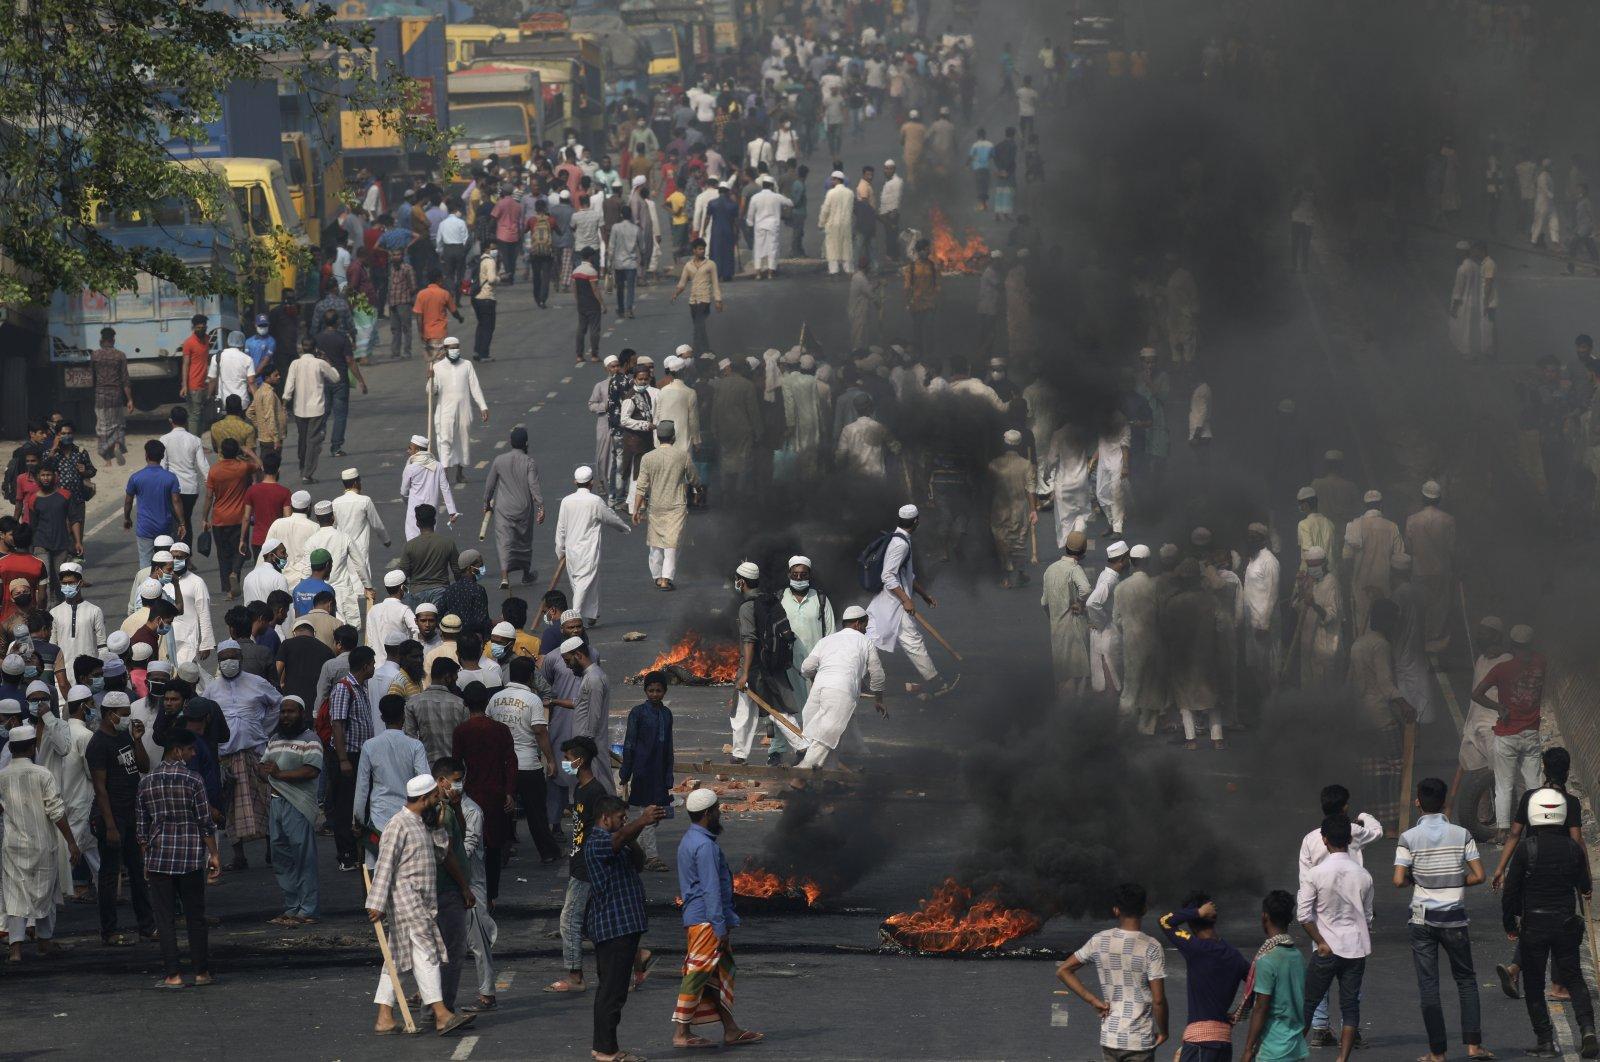 Activists of Bangladesh's Hefazat-e-Islam group burn tires to block traffic on the Dhaka Chittagong highway as they enforce a daylong general strike in Narayanganj, Bangladesh, March 28, 2021. (AP Photo)